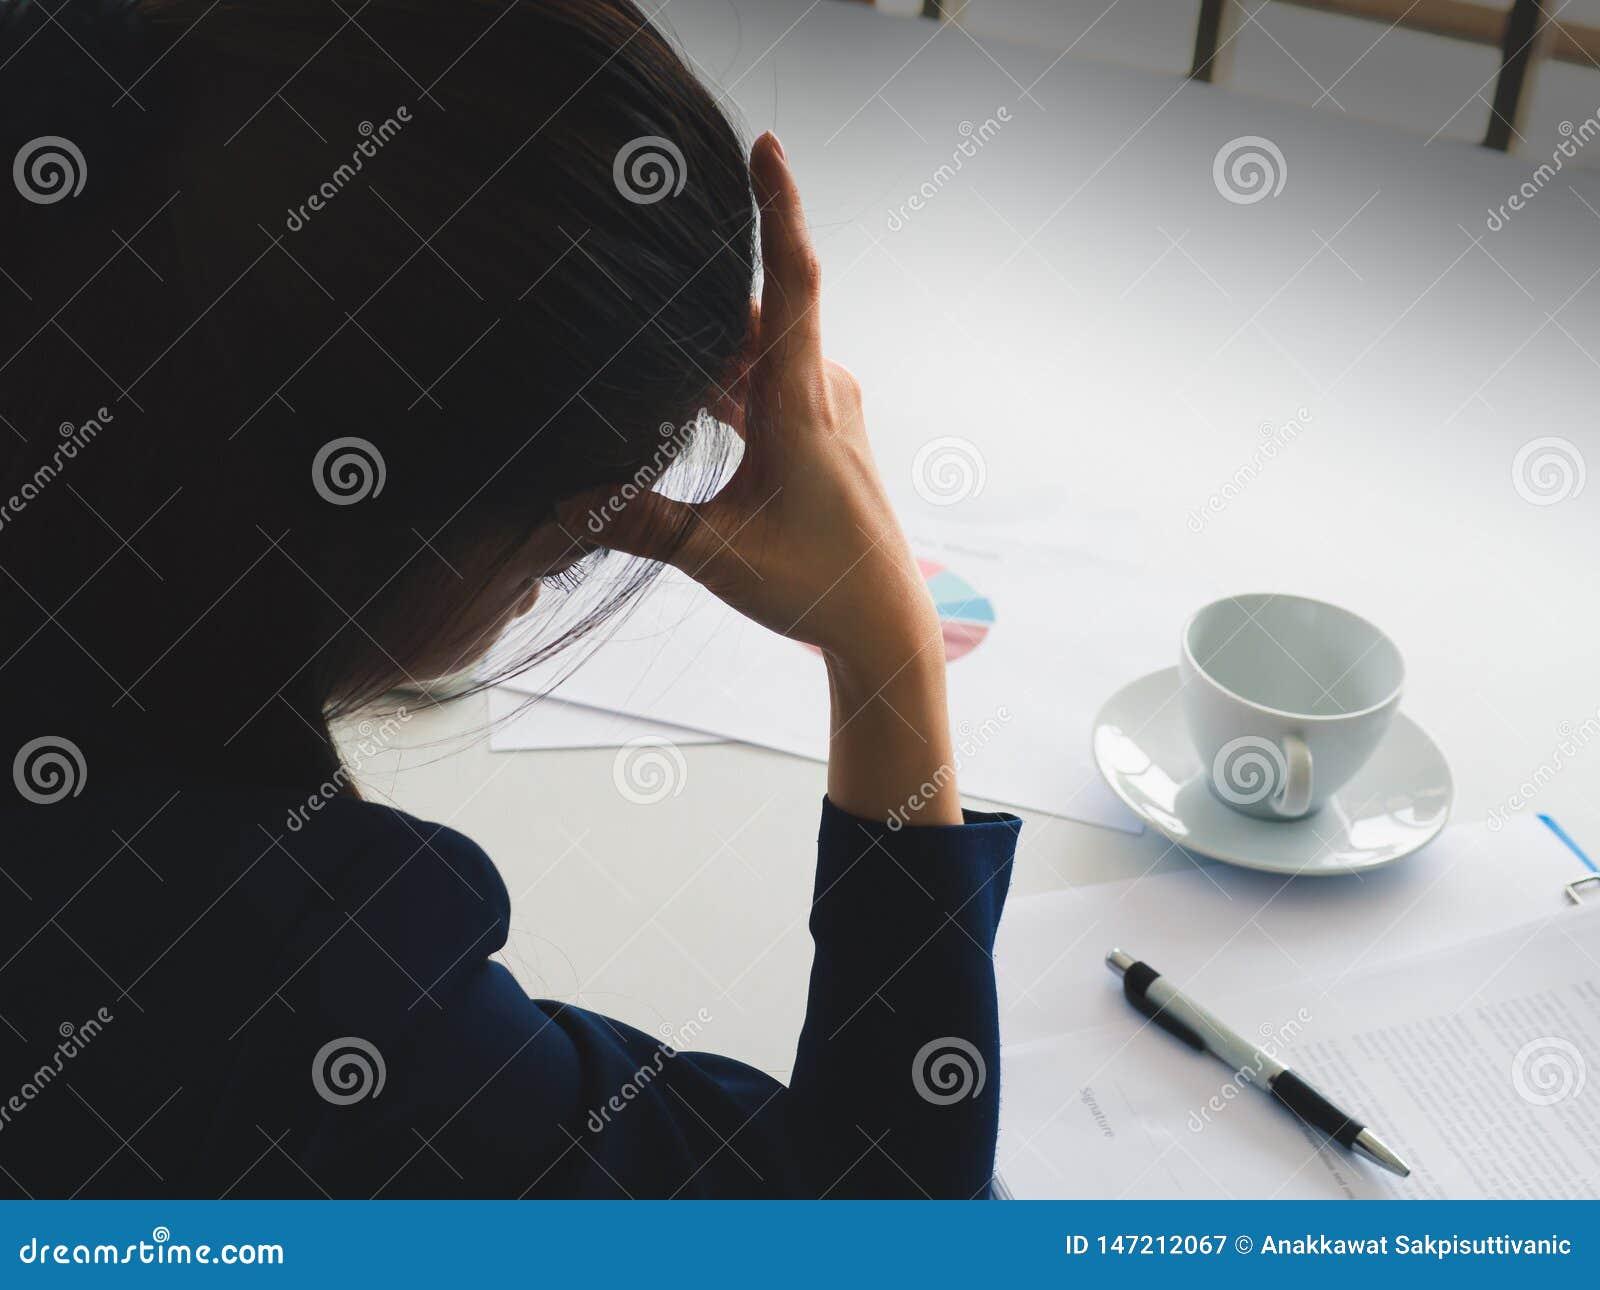 E Ha kaffekoppen, pennan, tekniker